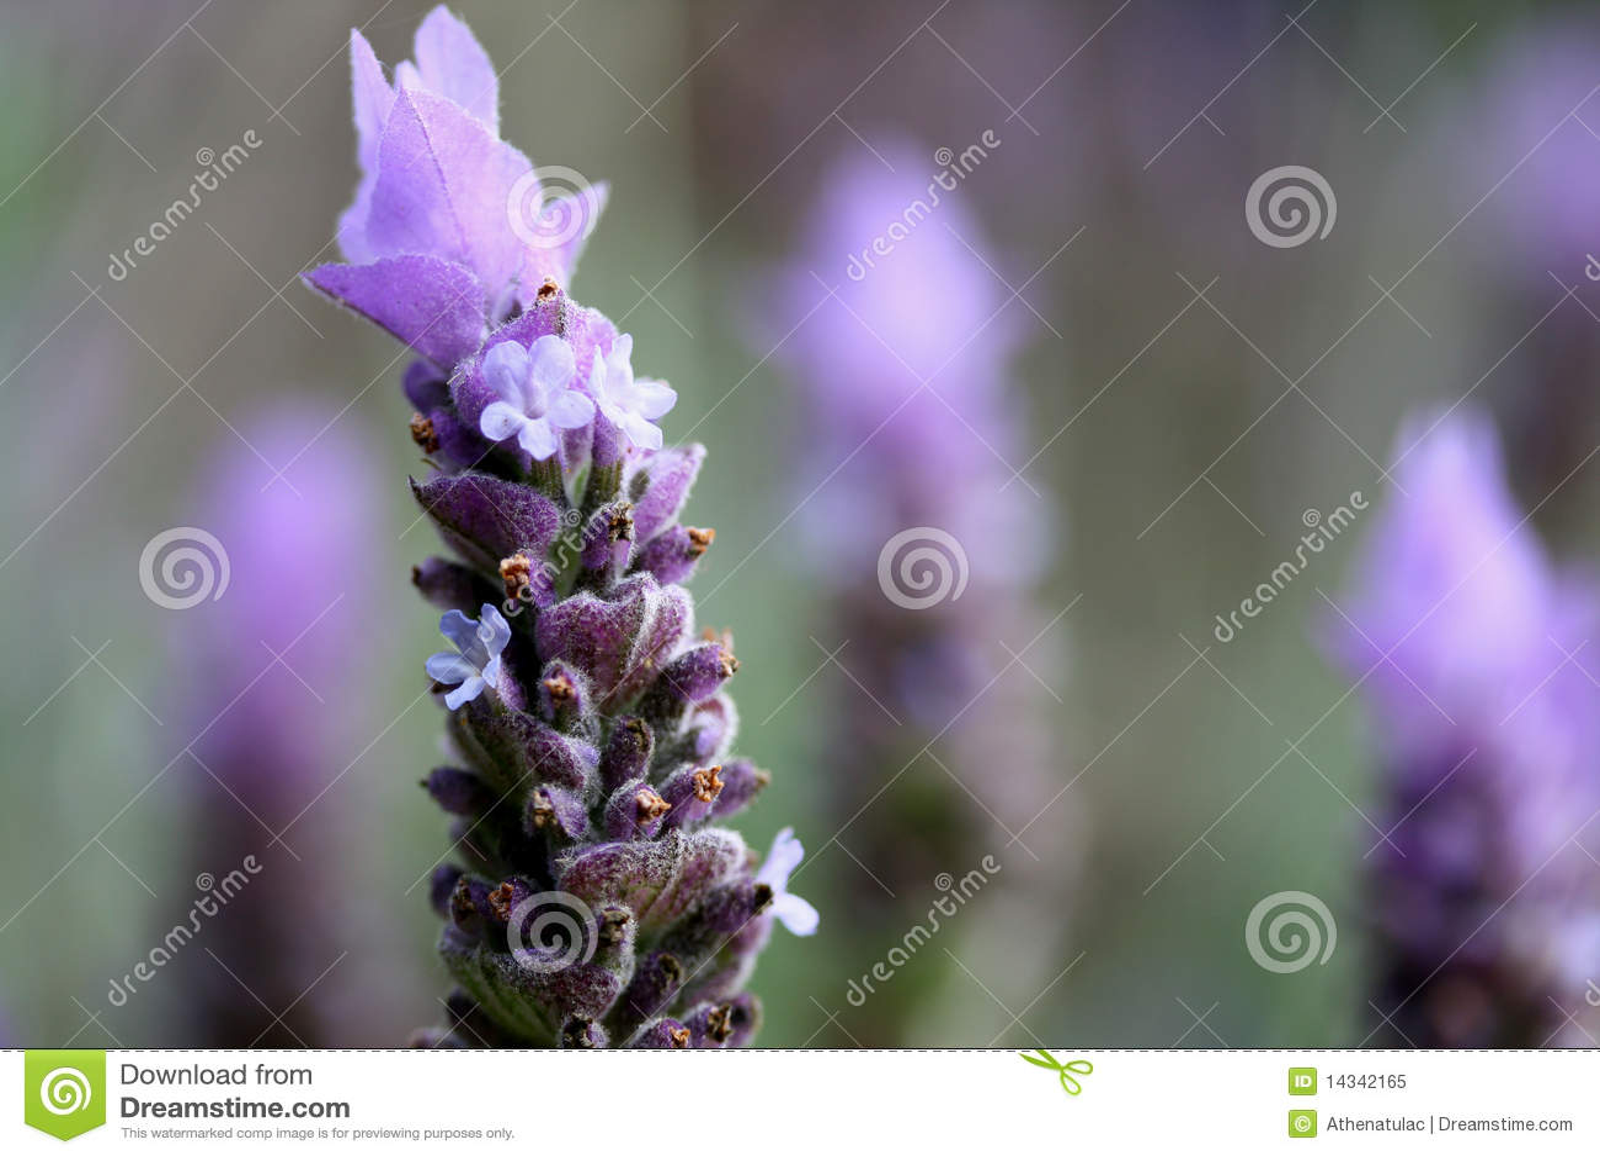 Pictur erepresents close uo of lavender flower Lavender Flower Close Up